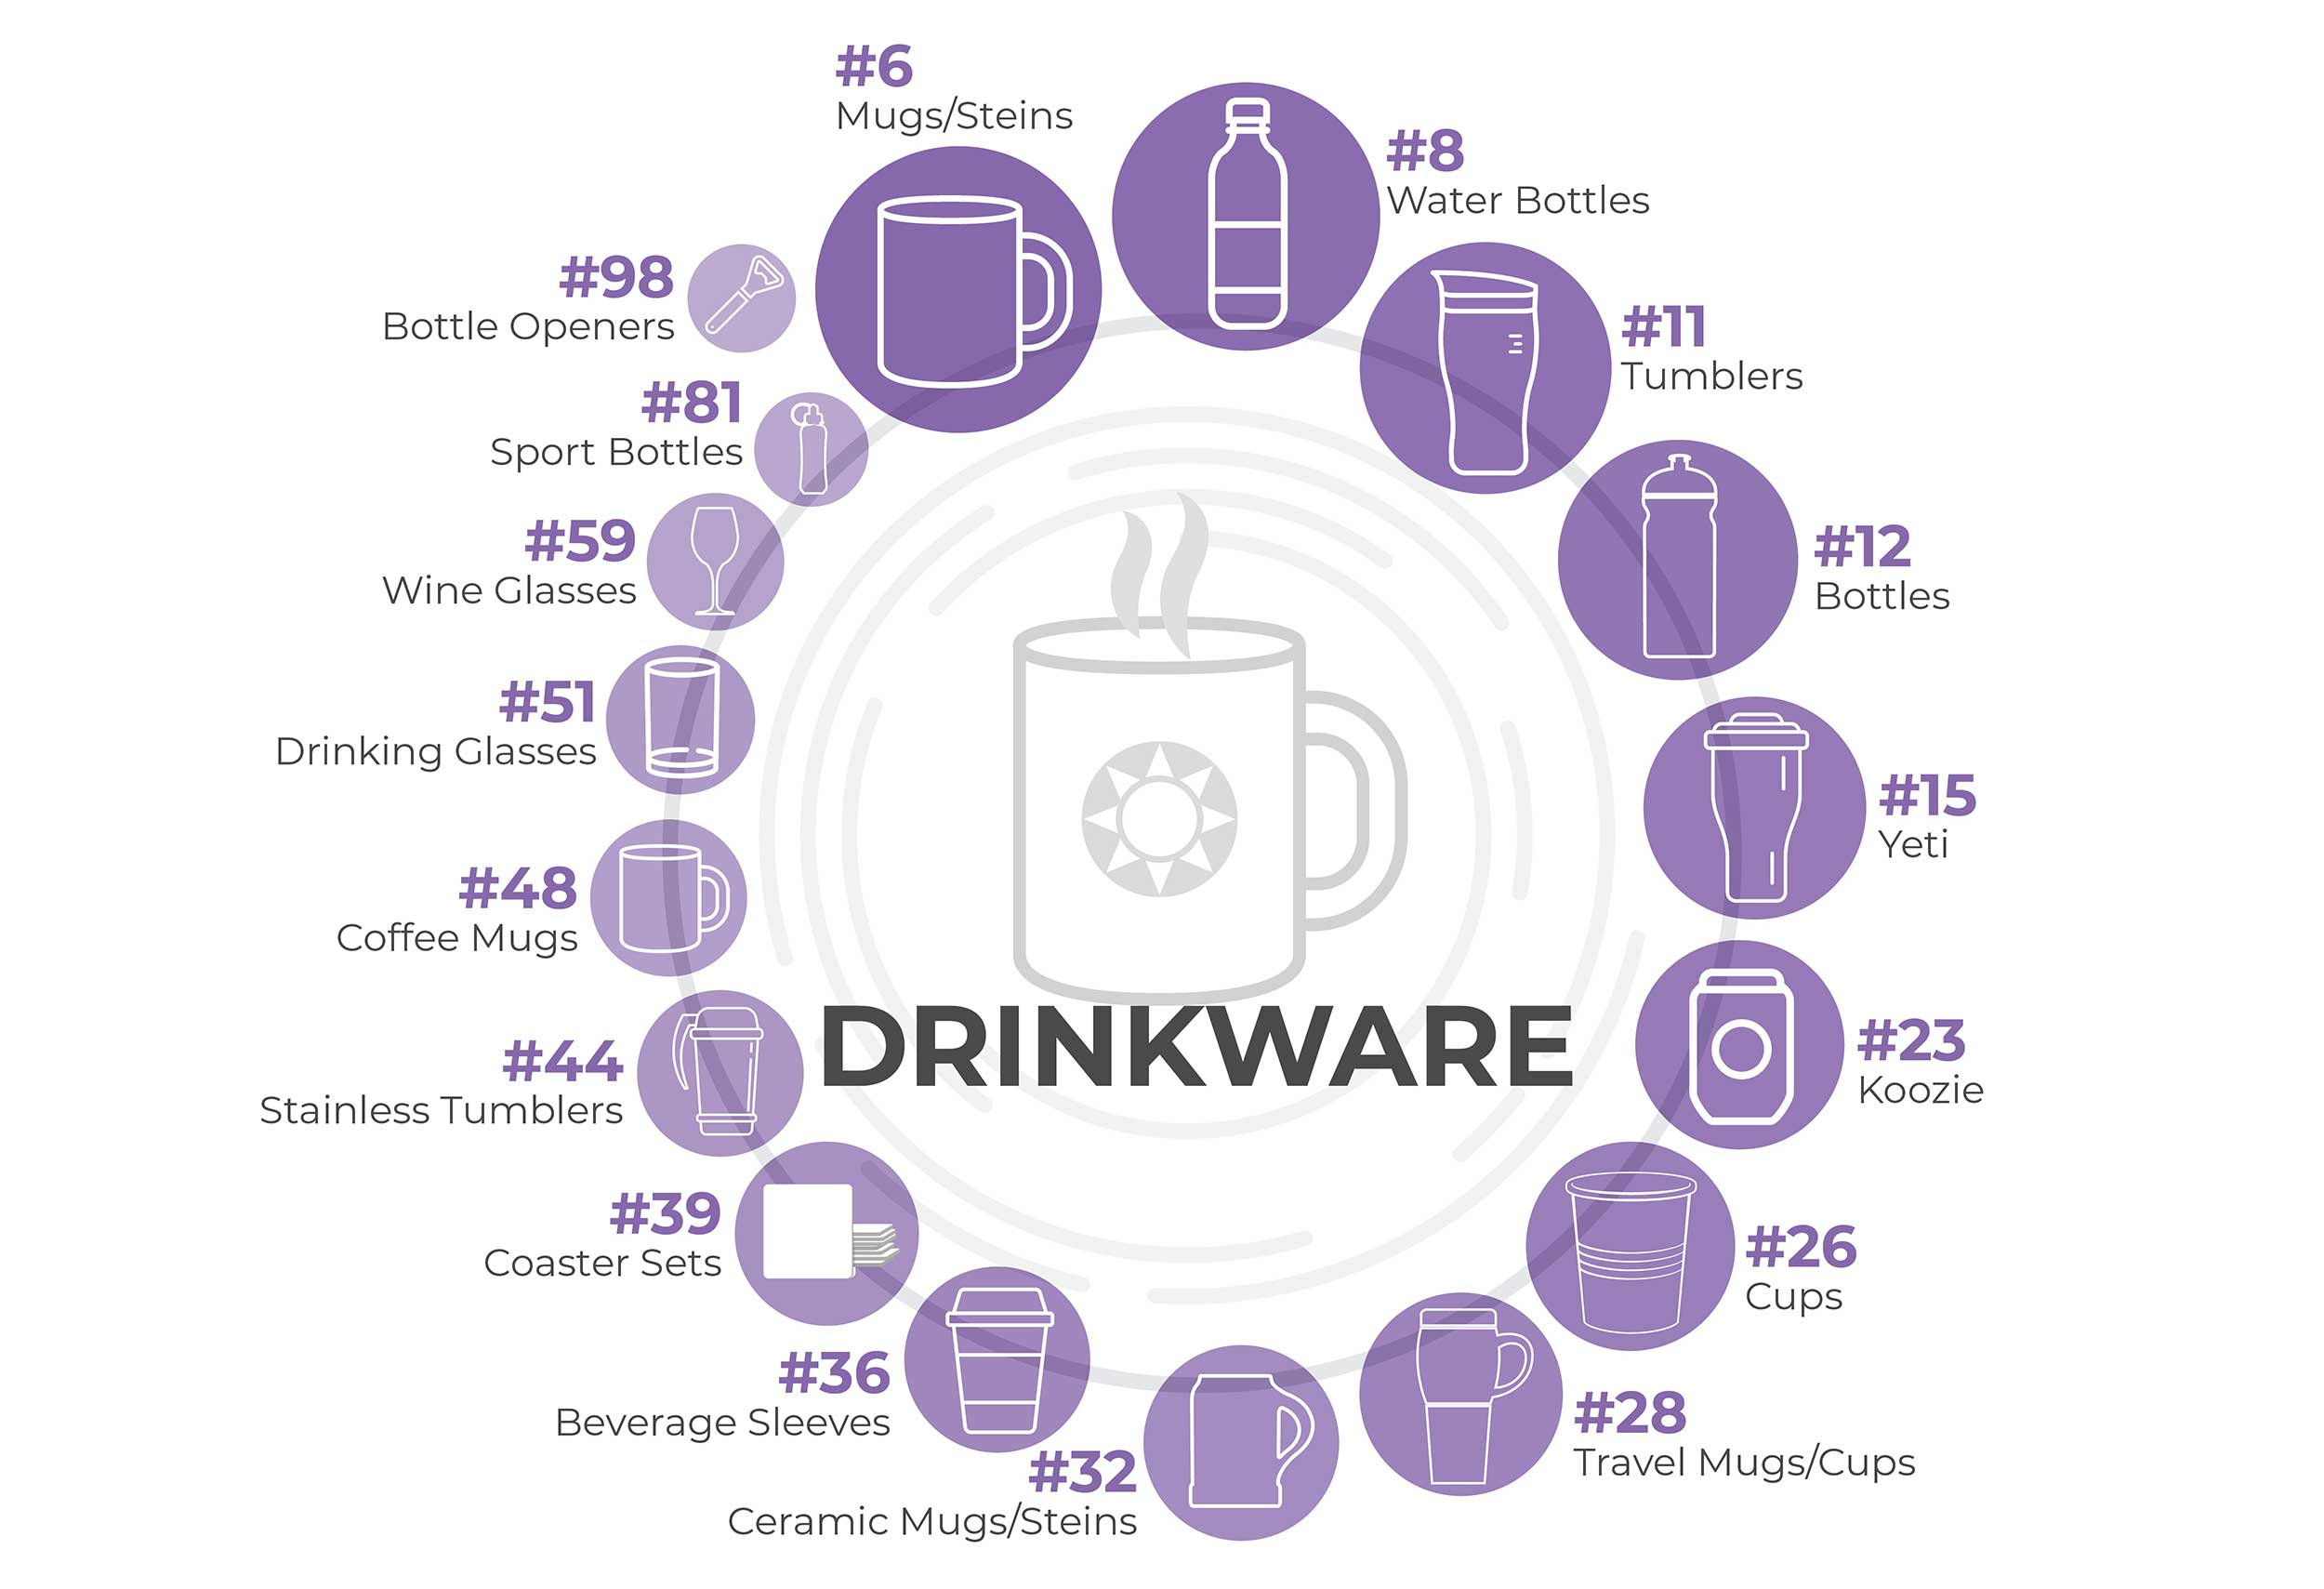 drinkware image